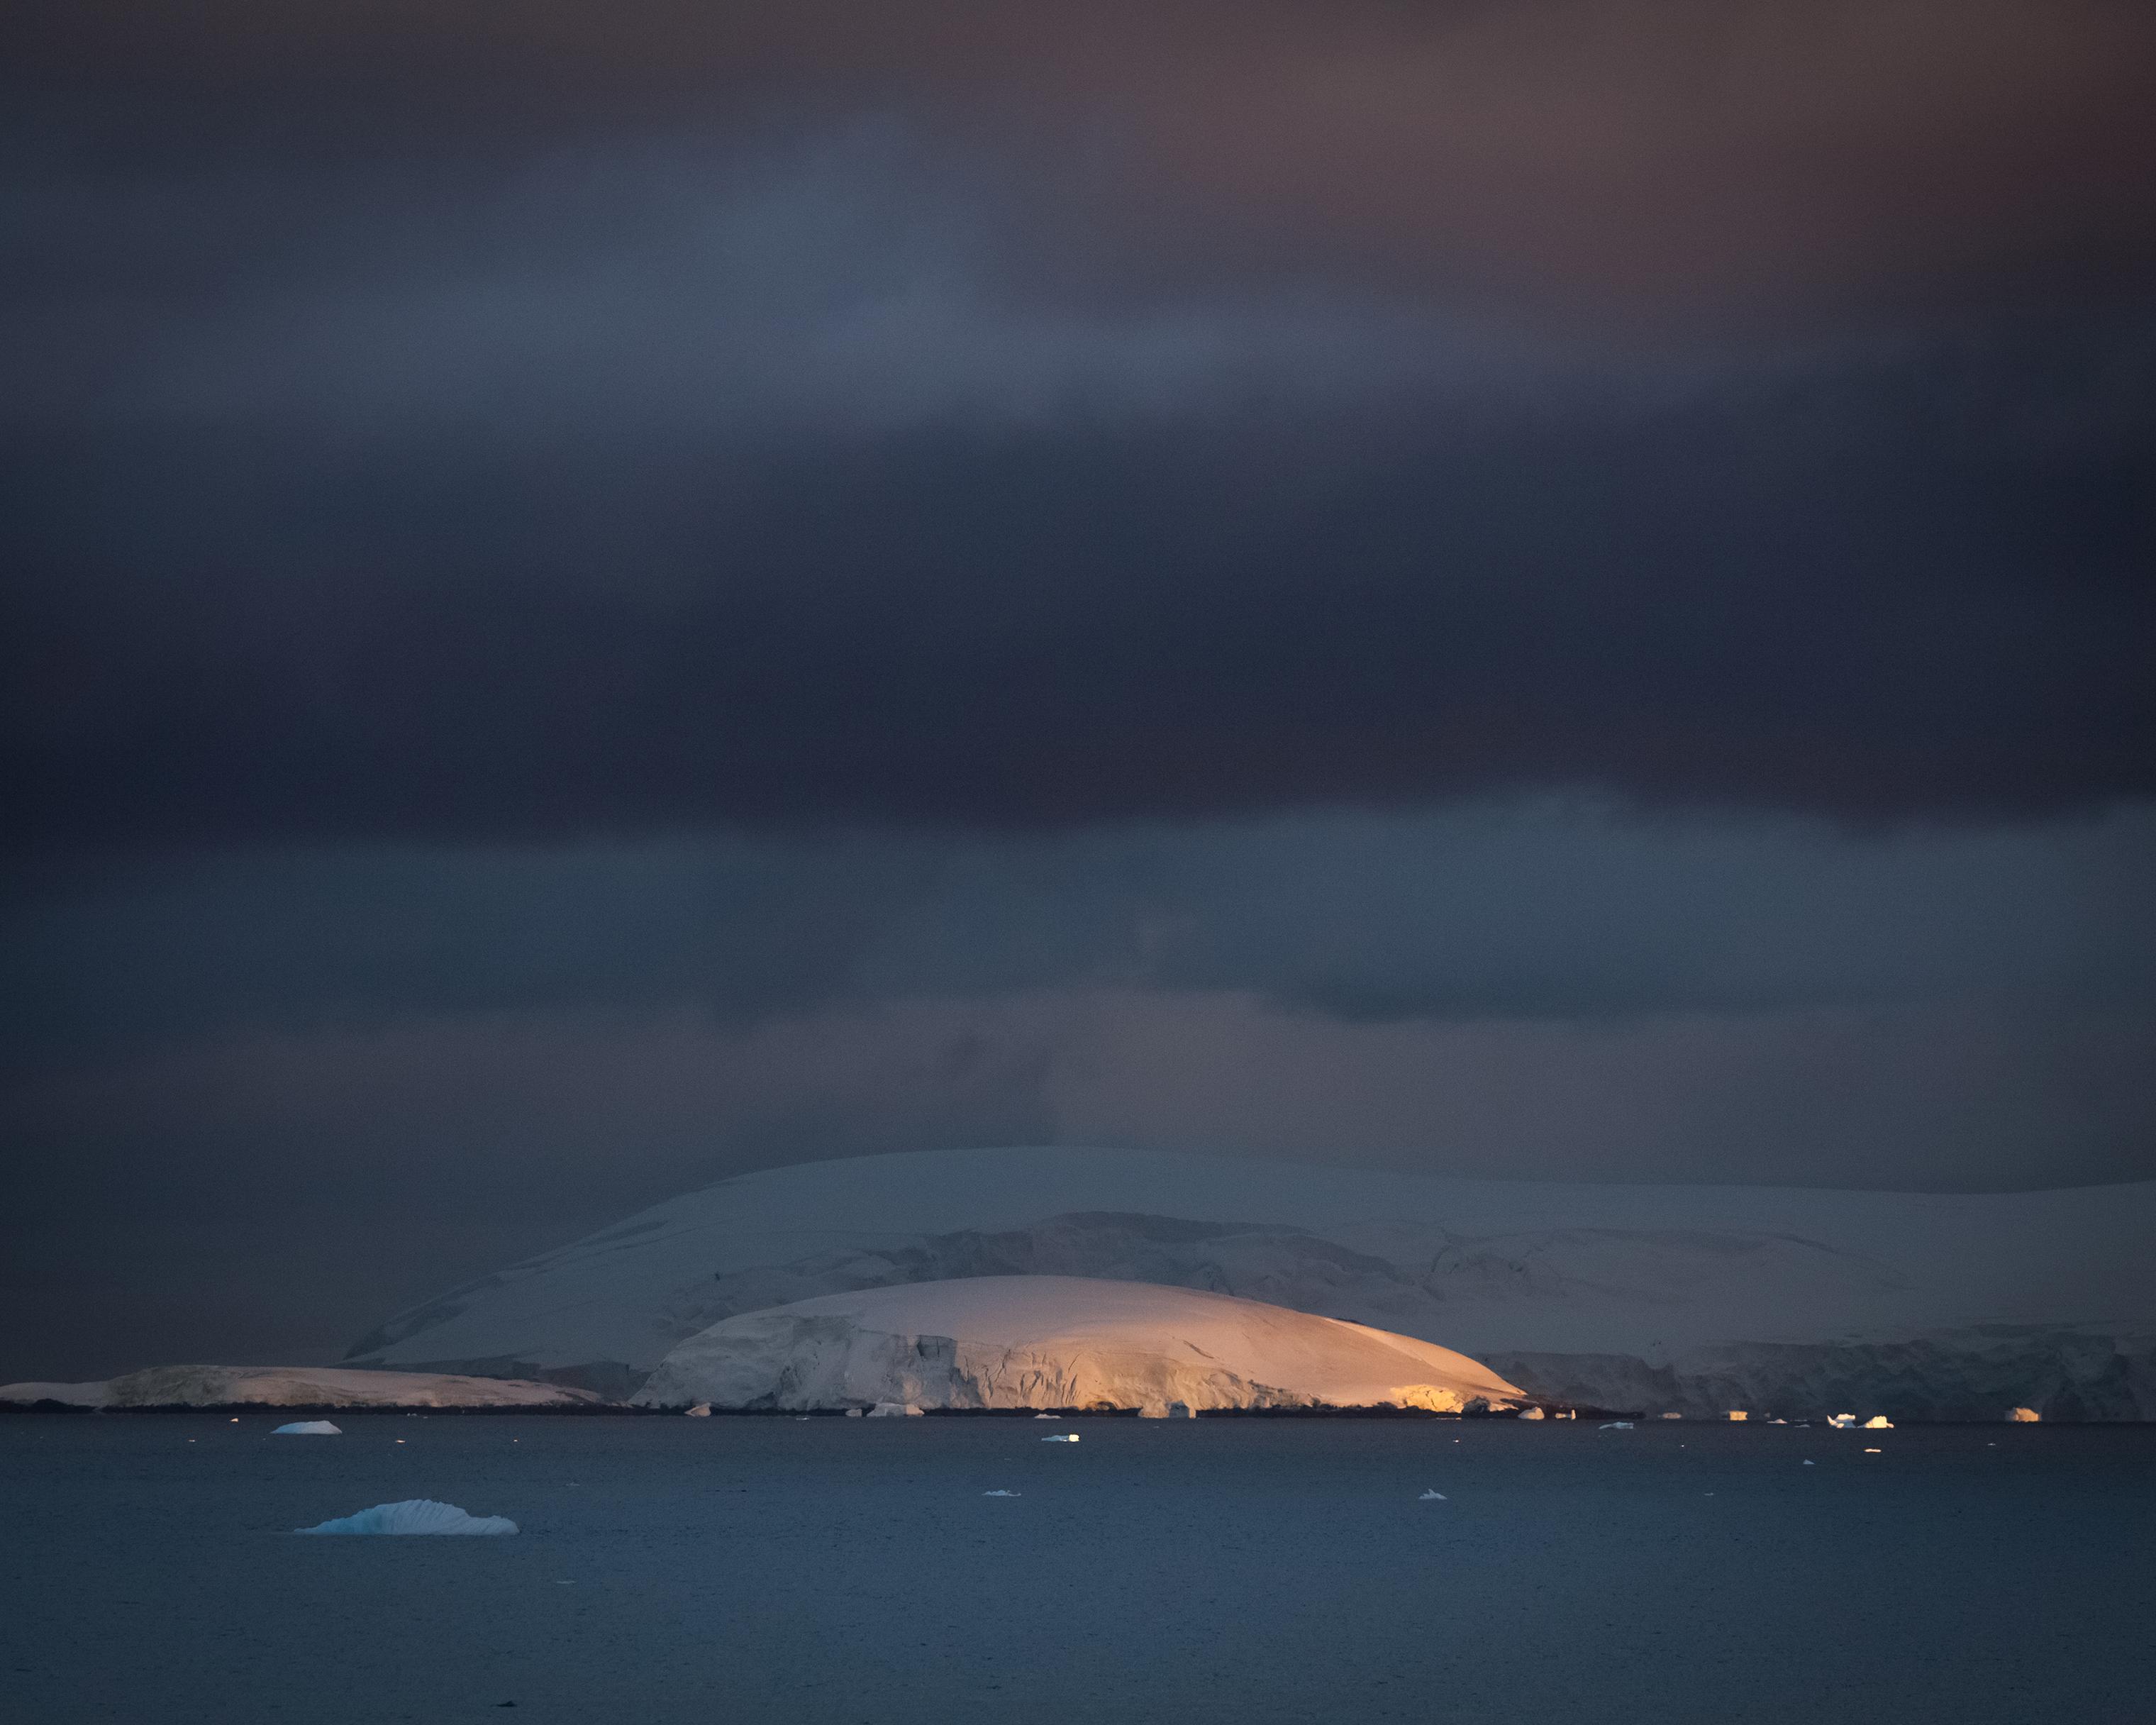 Sunrise near the Lemaire Channel, Antarctica.